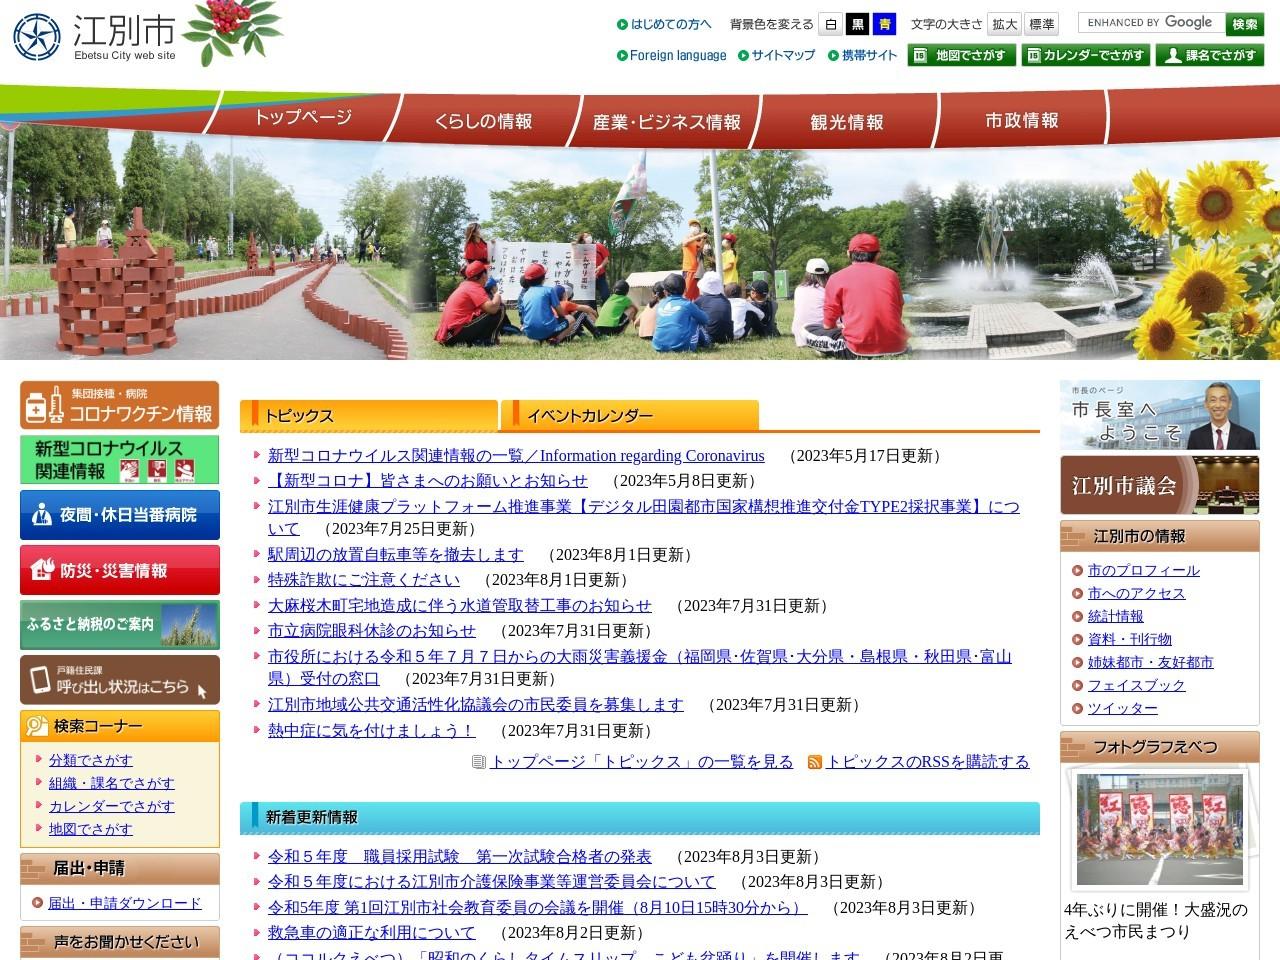 http://www.city.ebetsu.hokkaido.jp/site/kyouiku/17718.html